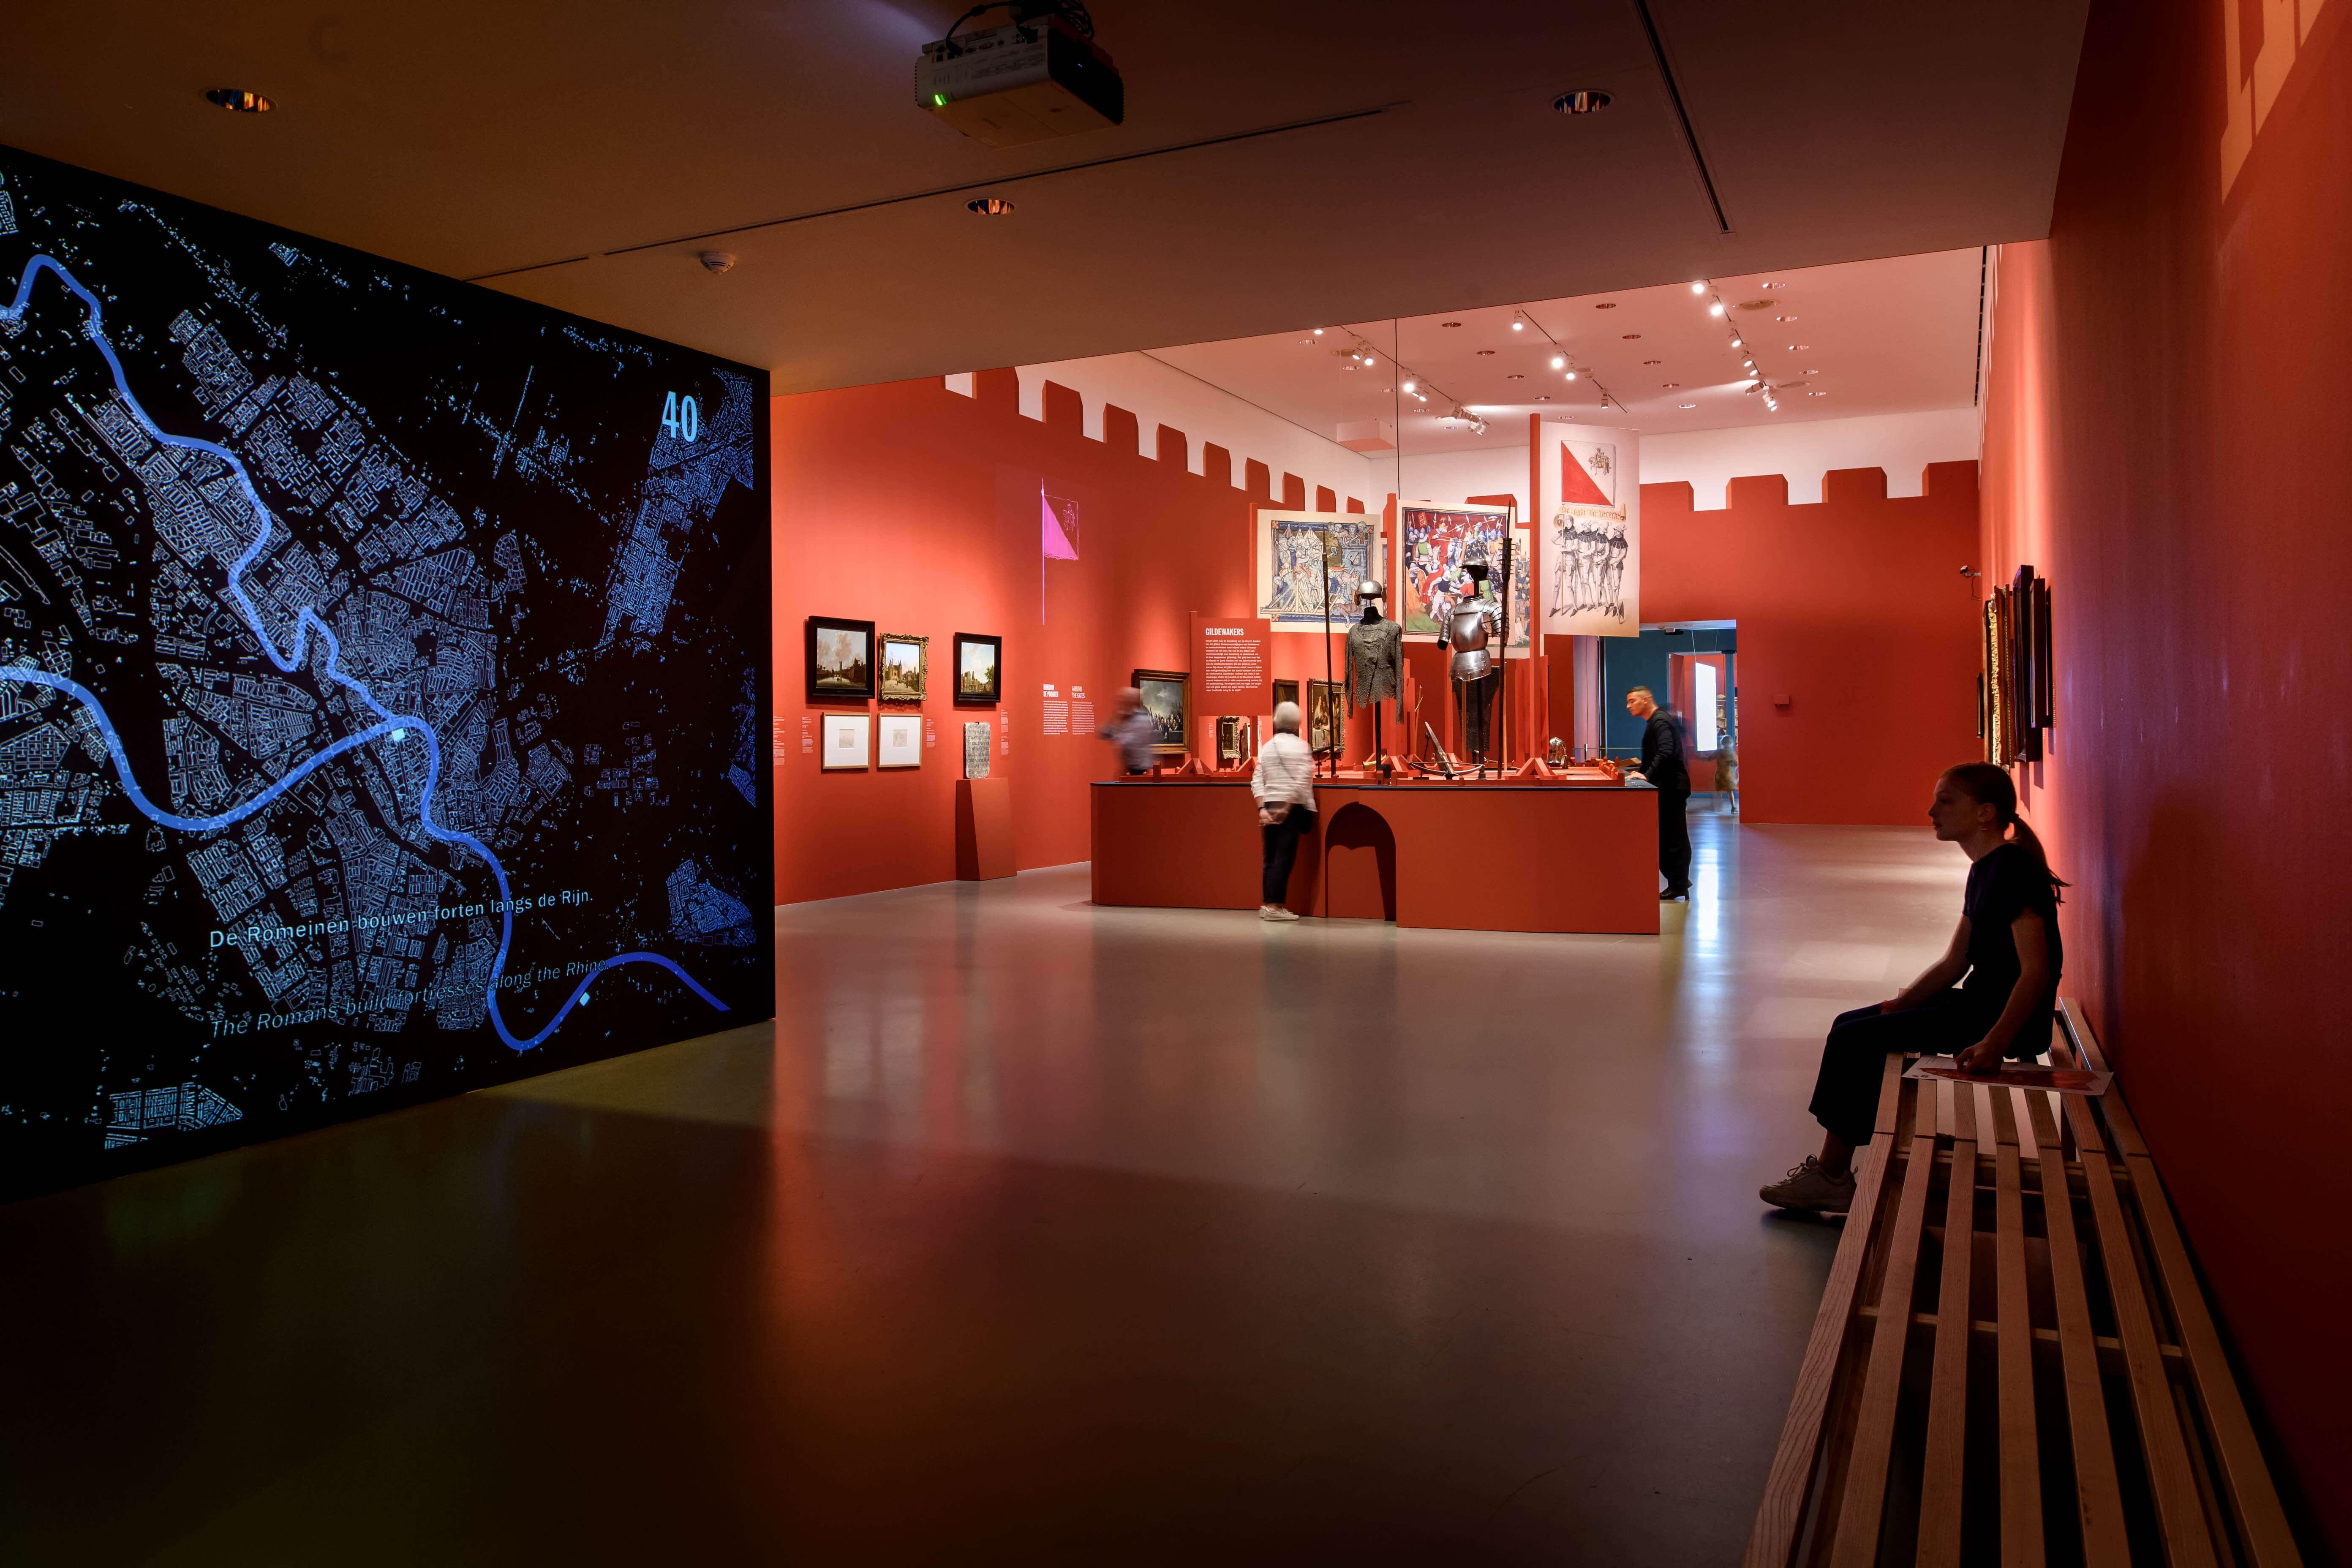 tentoonstelling de ommuurde stad centraal museum 2 1 jpg